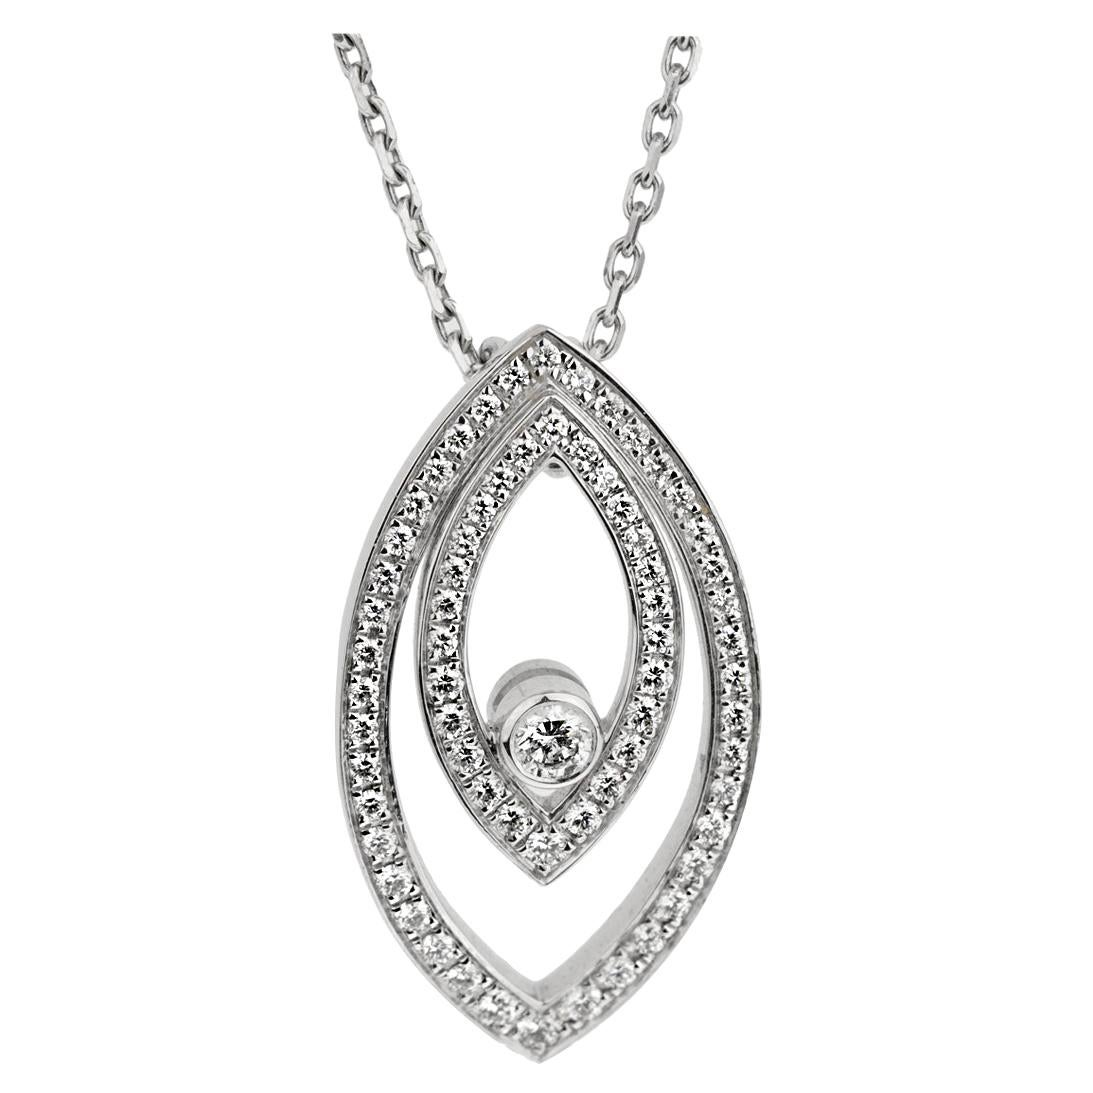 Chopard White Gold Diamond Eye Pendant Necklace